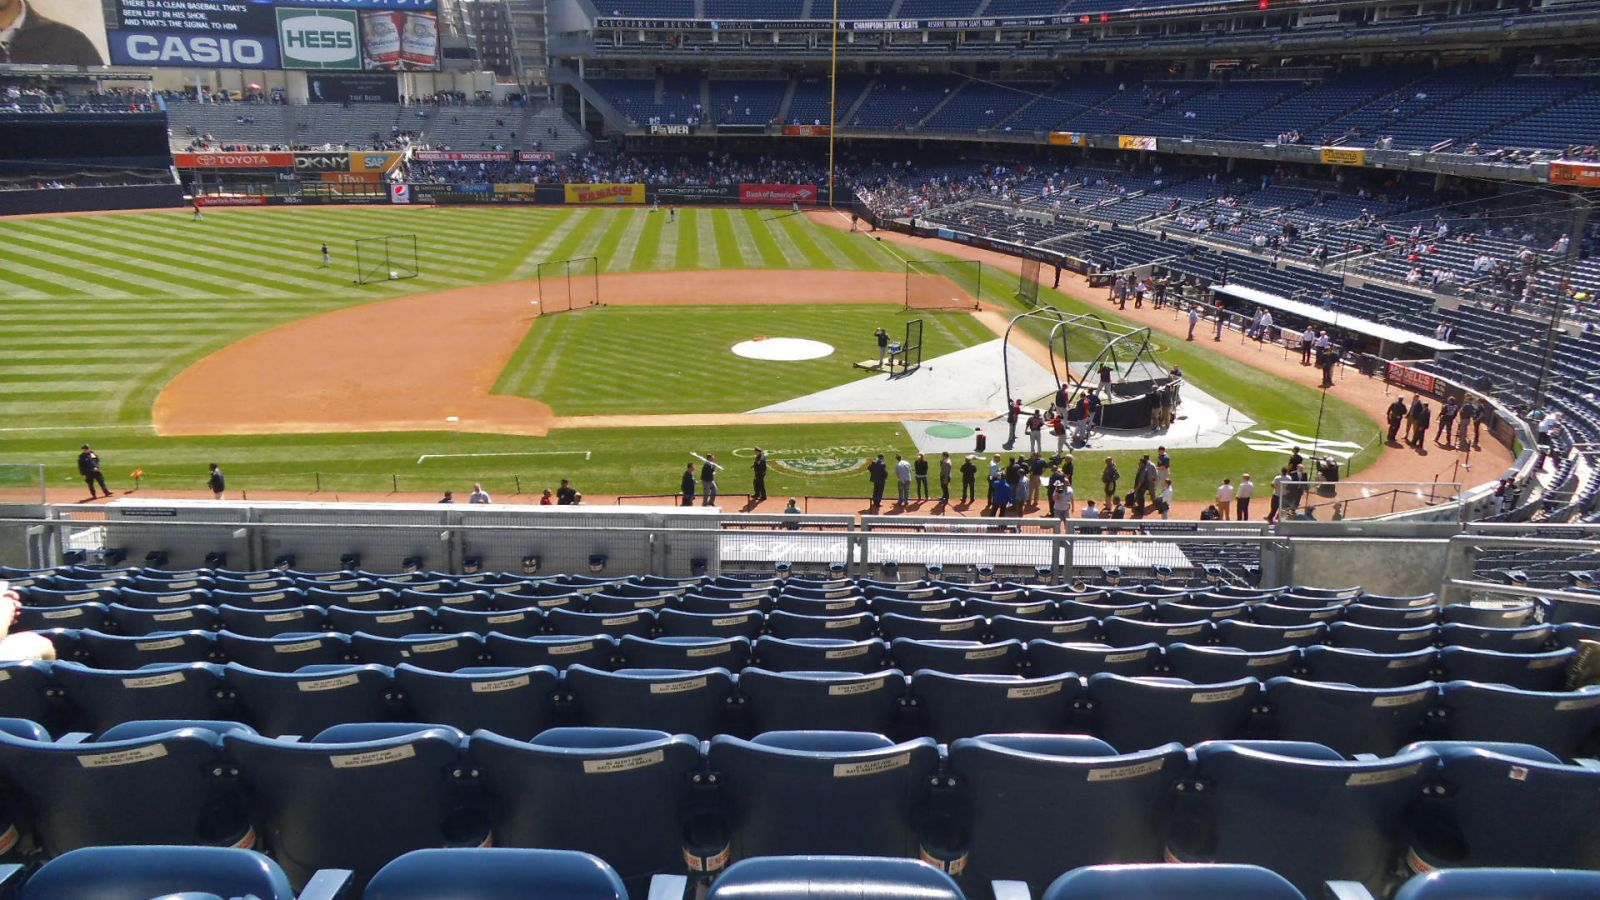 Yankee Stadium Section 224 - New York Yankees - RateYourSeats.com